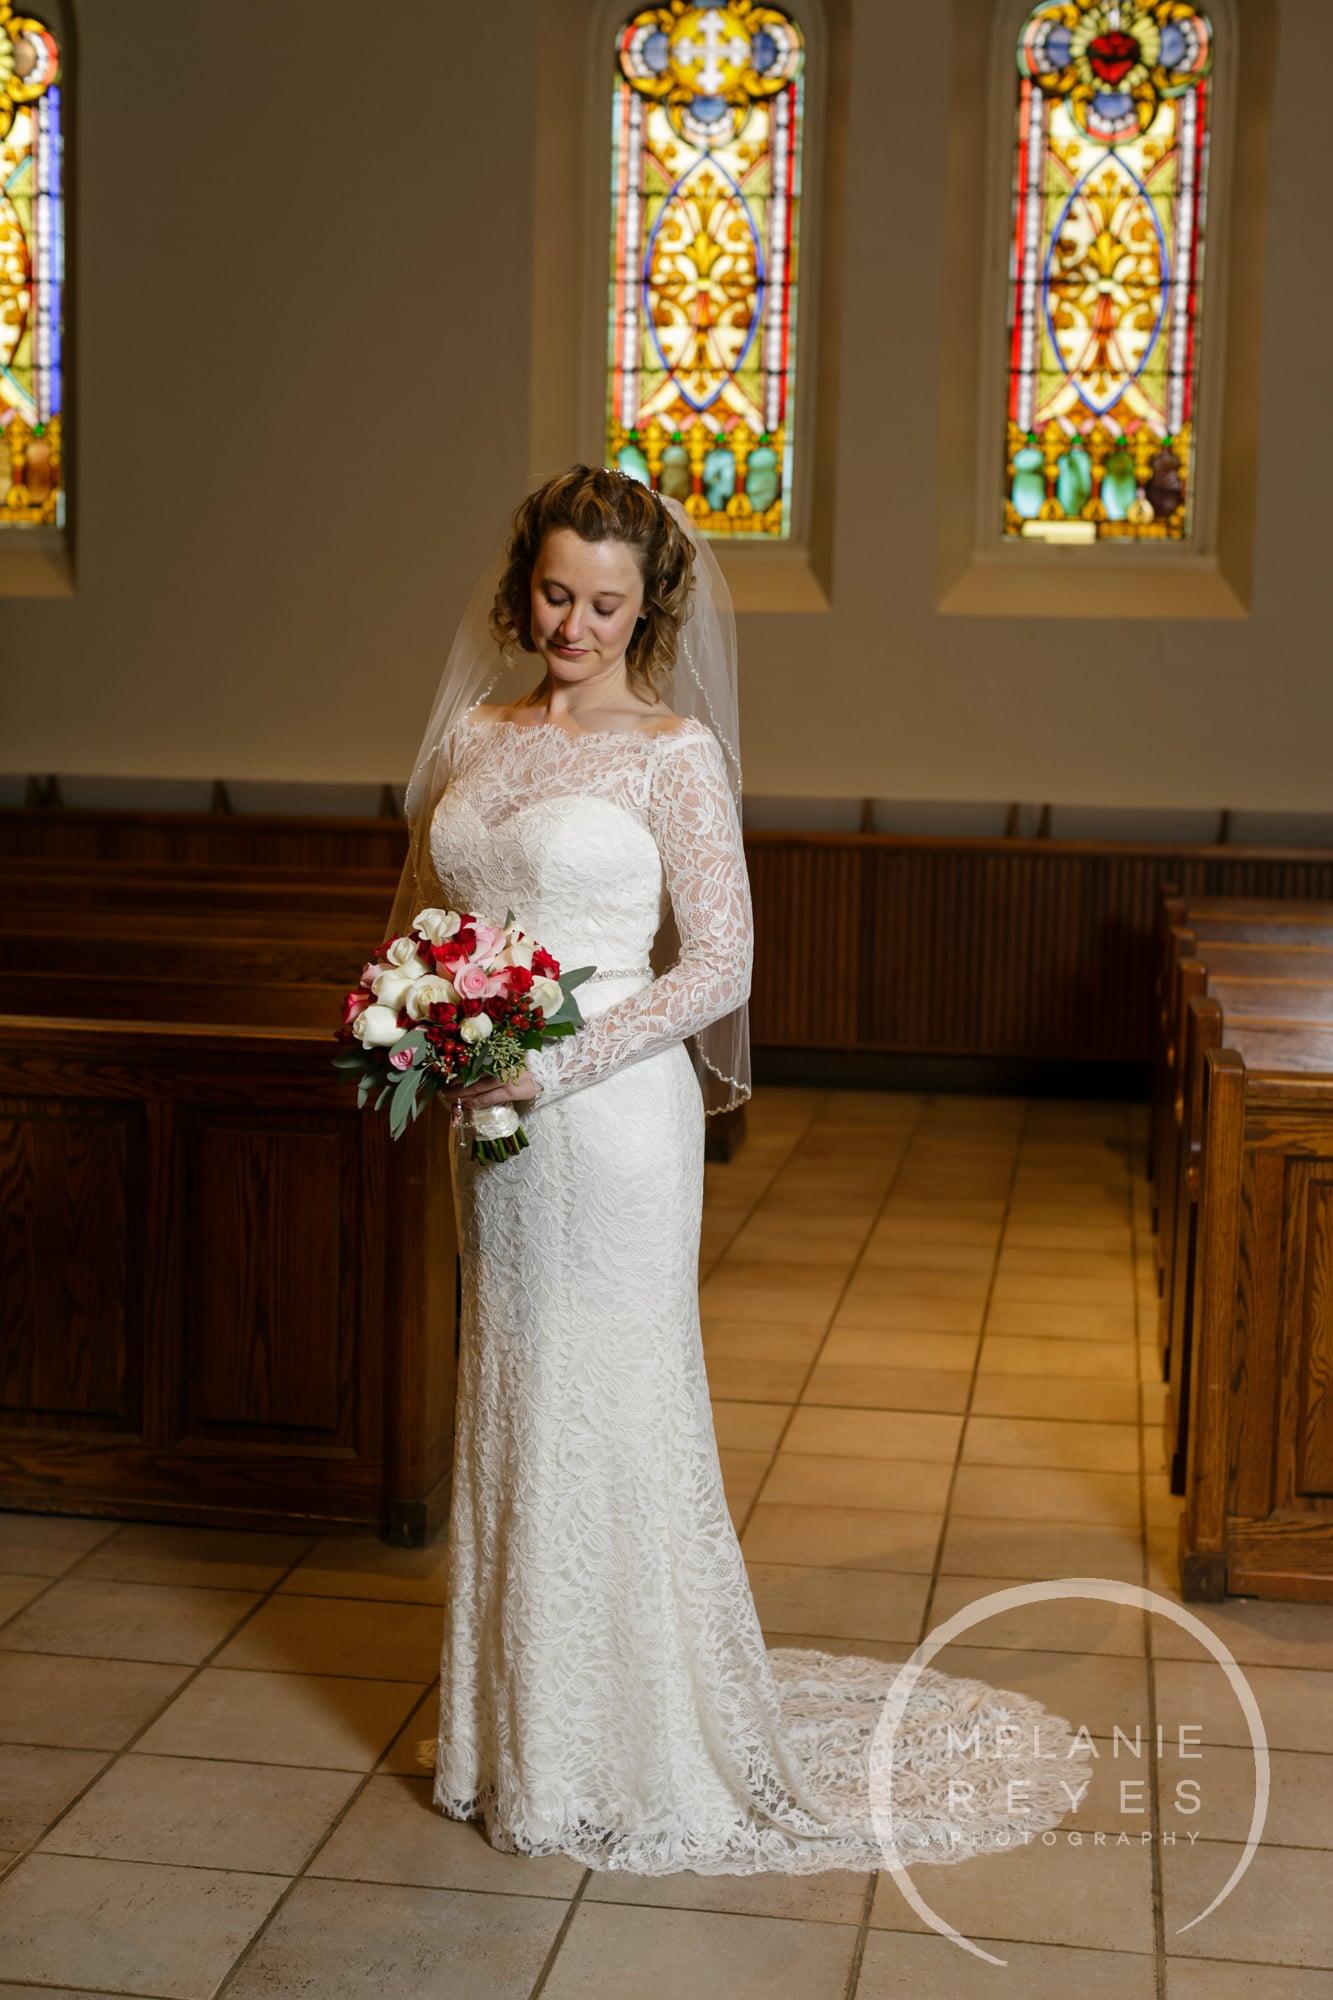 2015_ann_arbor_wedding_photographer_melaniereyes_007.JPG